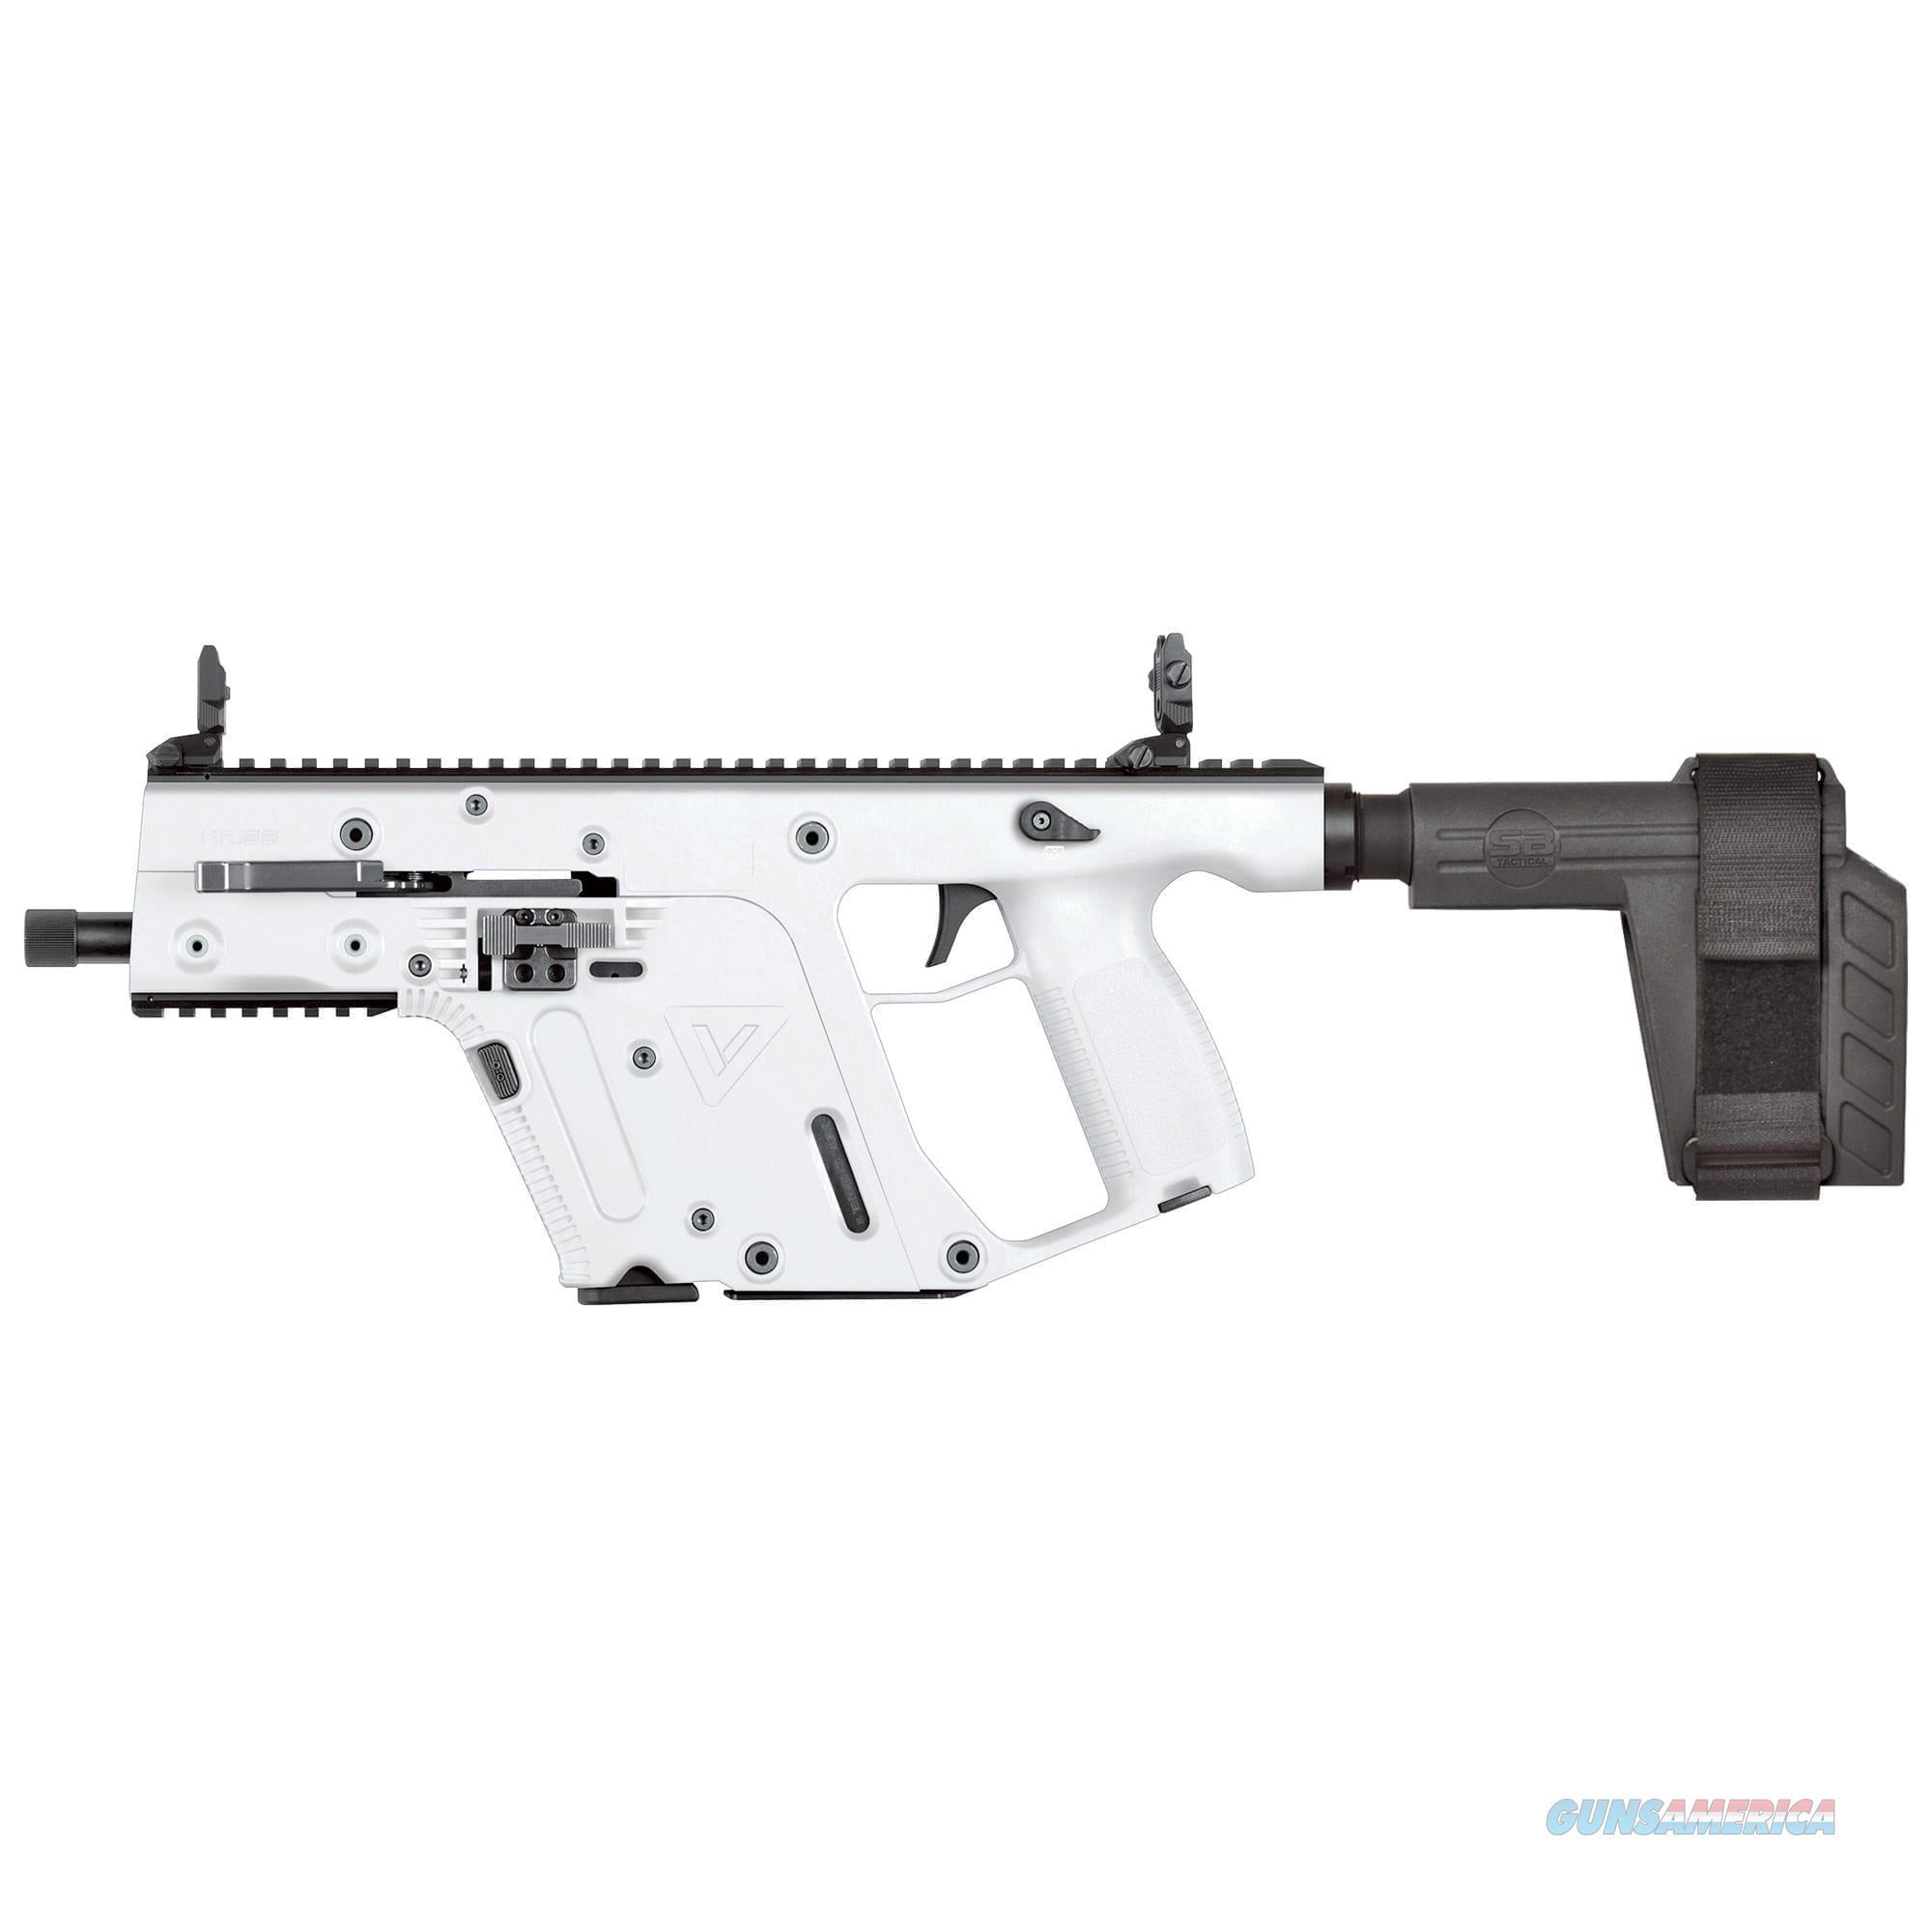 "Kriss Vector 22 SDP-SB Gen II .22 LR 6.5"" 10 Rds Alpine KV22-PSBAP00  Guns > Rifles > Kriss Tactical Rifles"